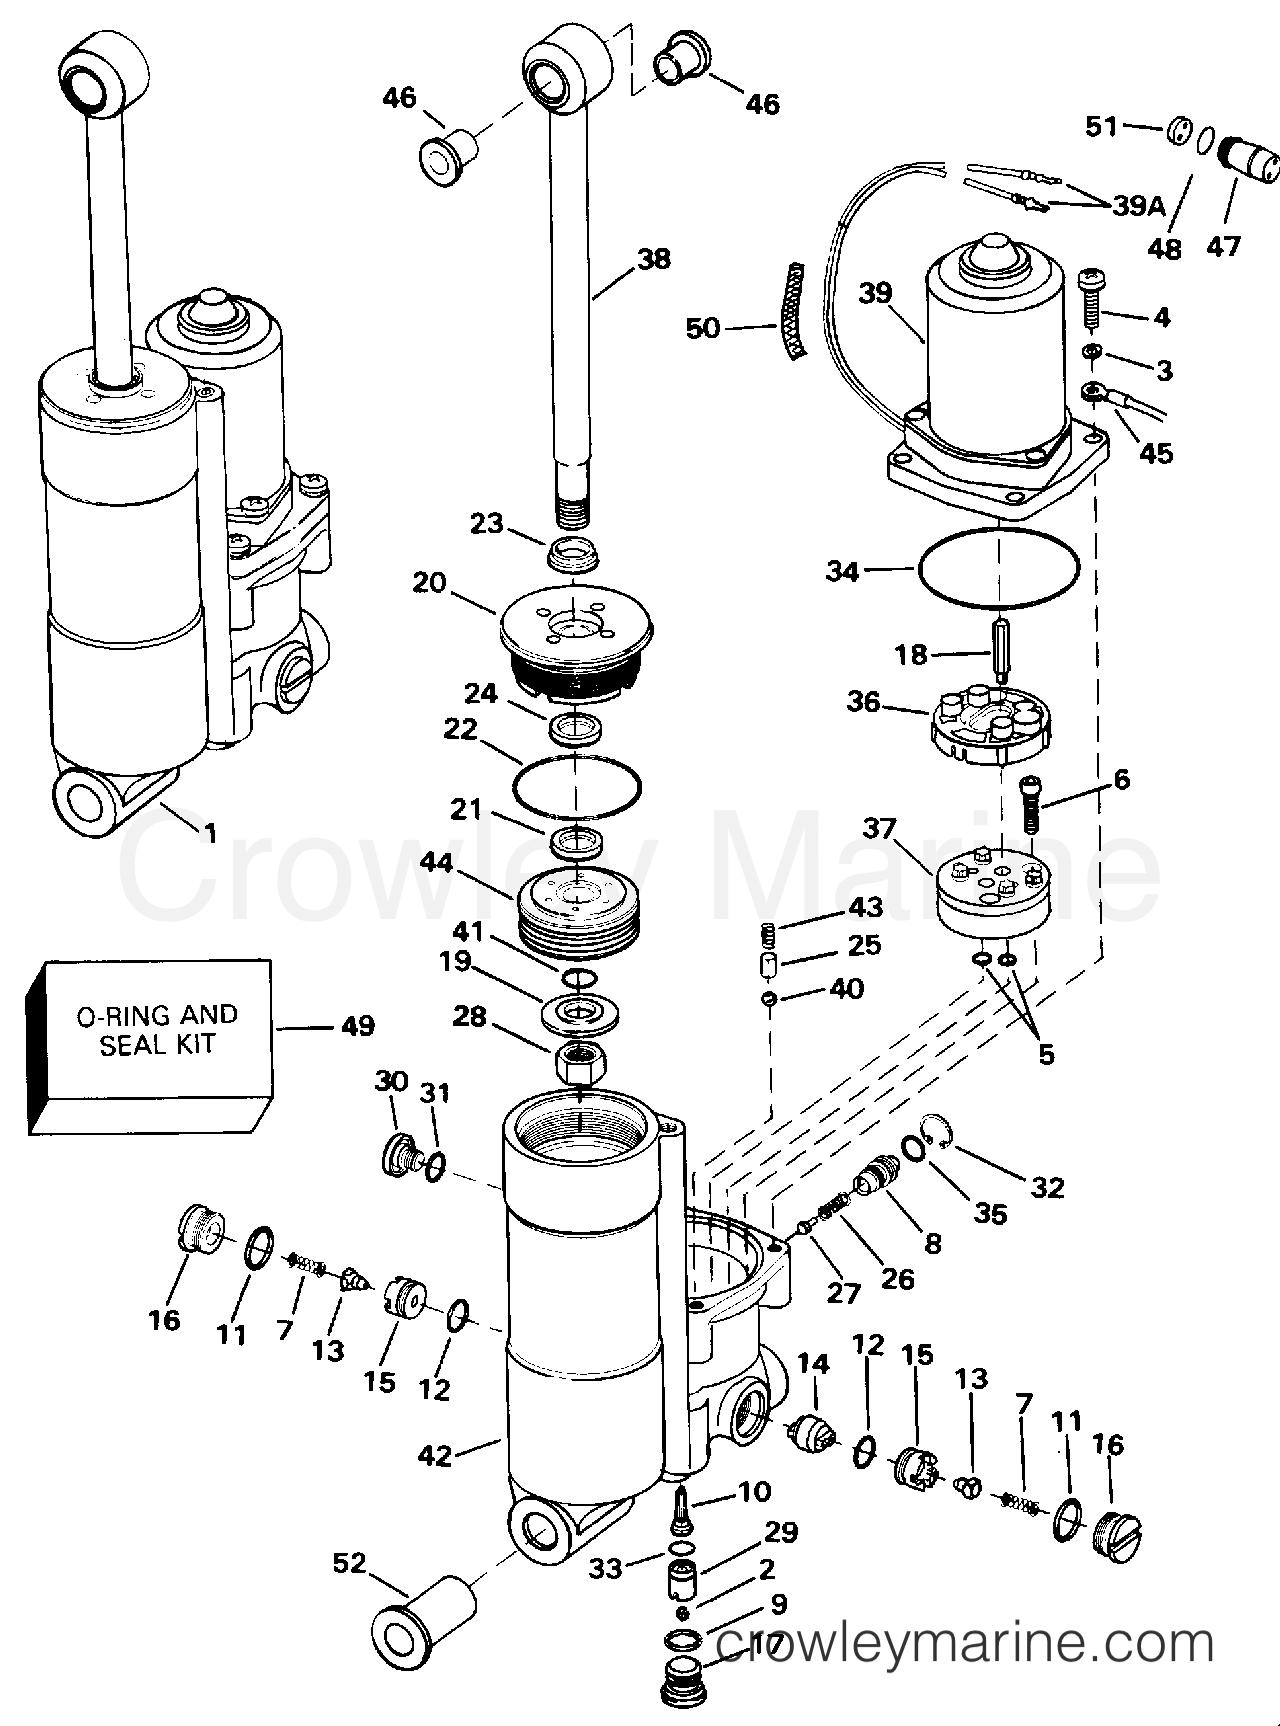 Array power trim tilt b model number suffix only 1993 evinrude rh crowleymarine